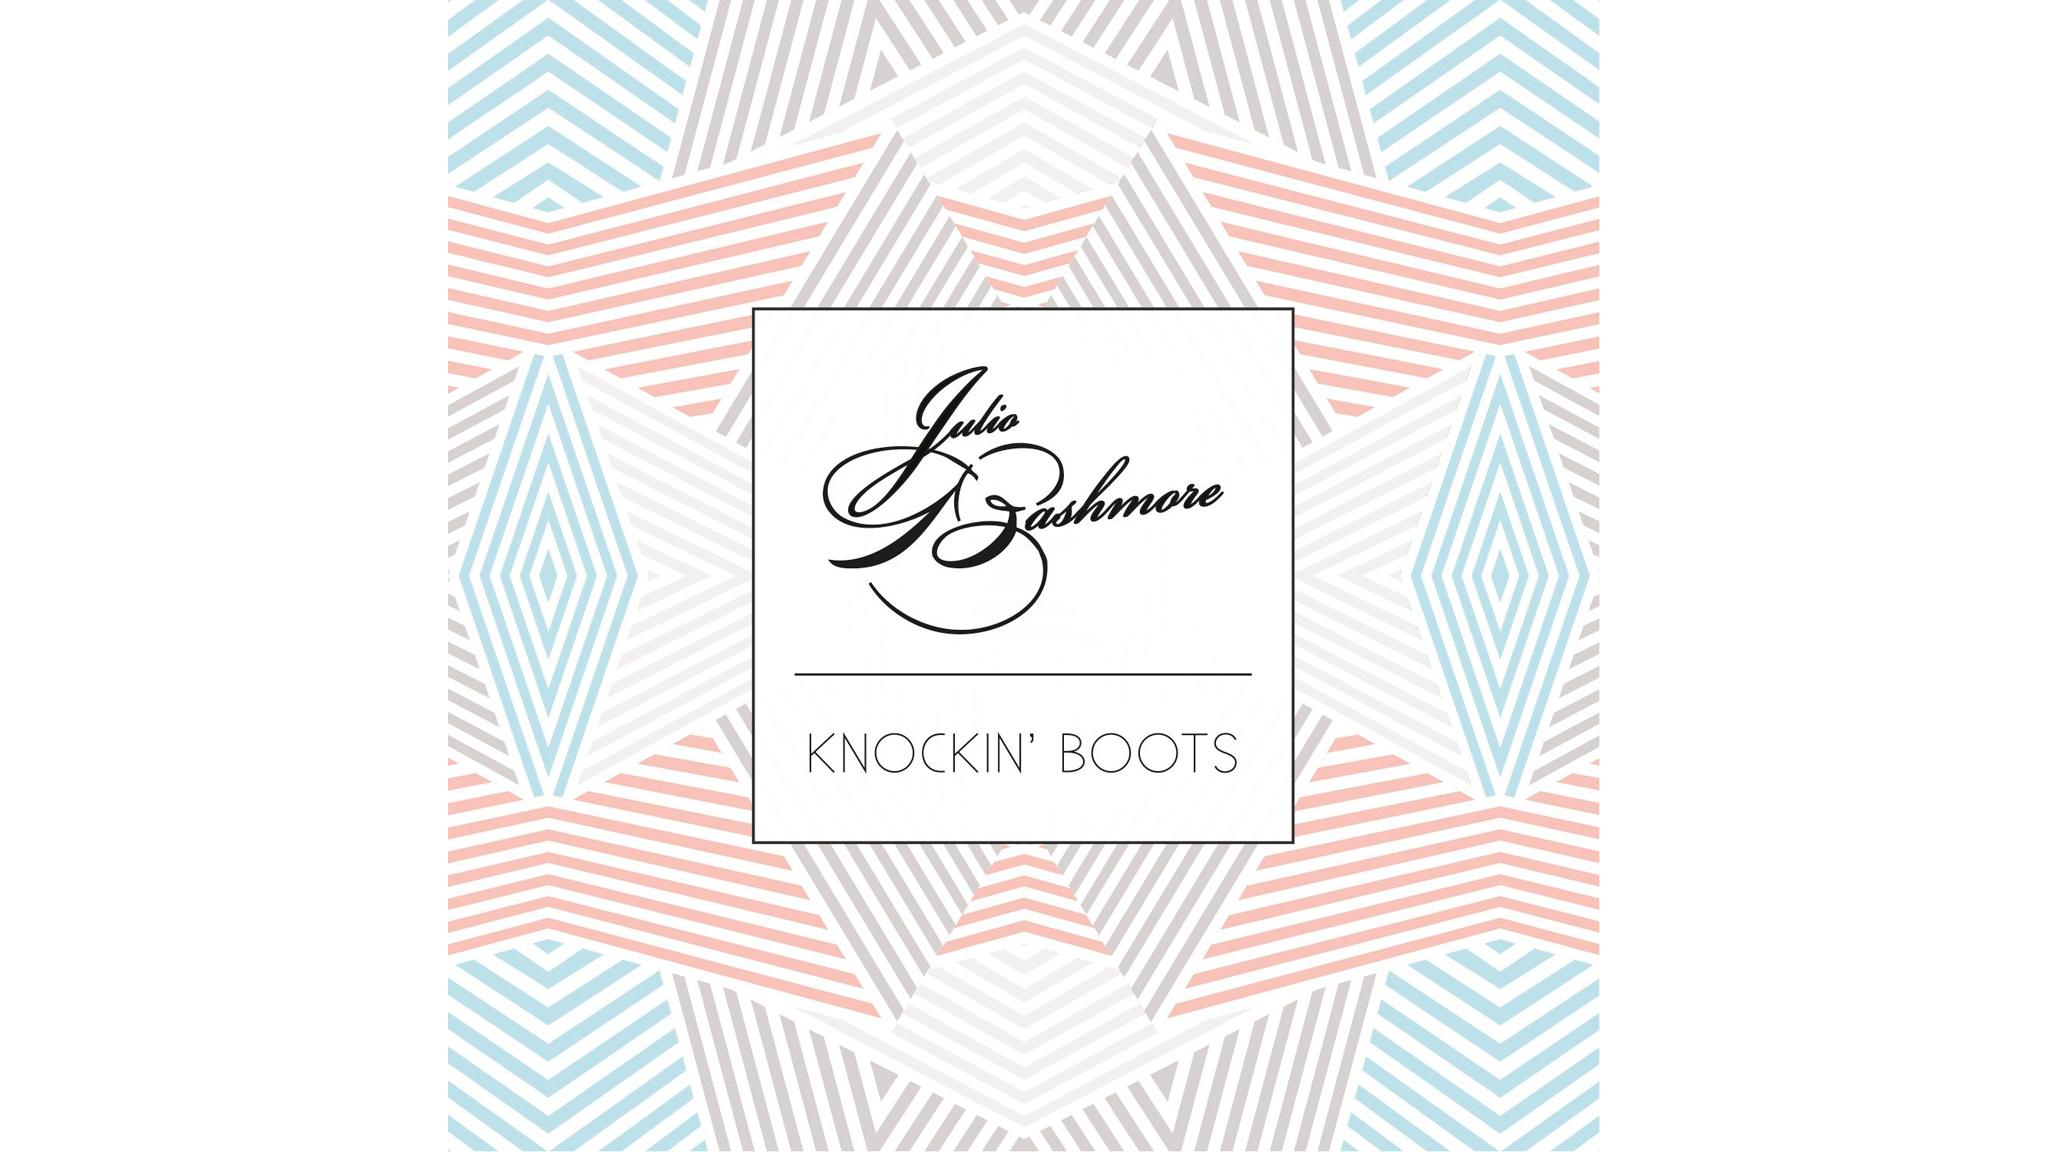 Julio Bashmore – 'Knockin' Boots' album review